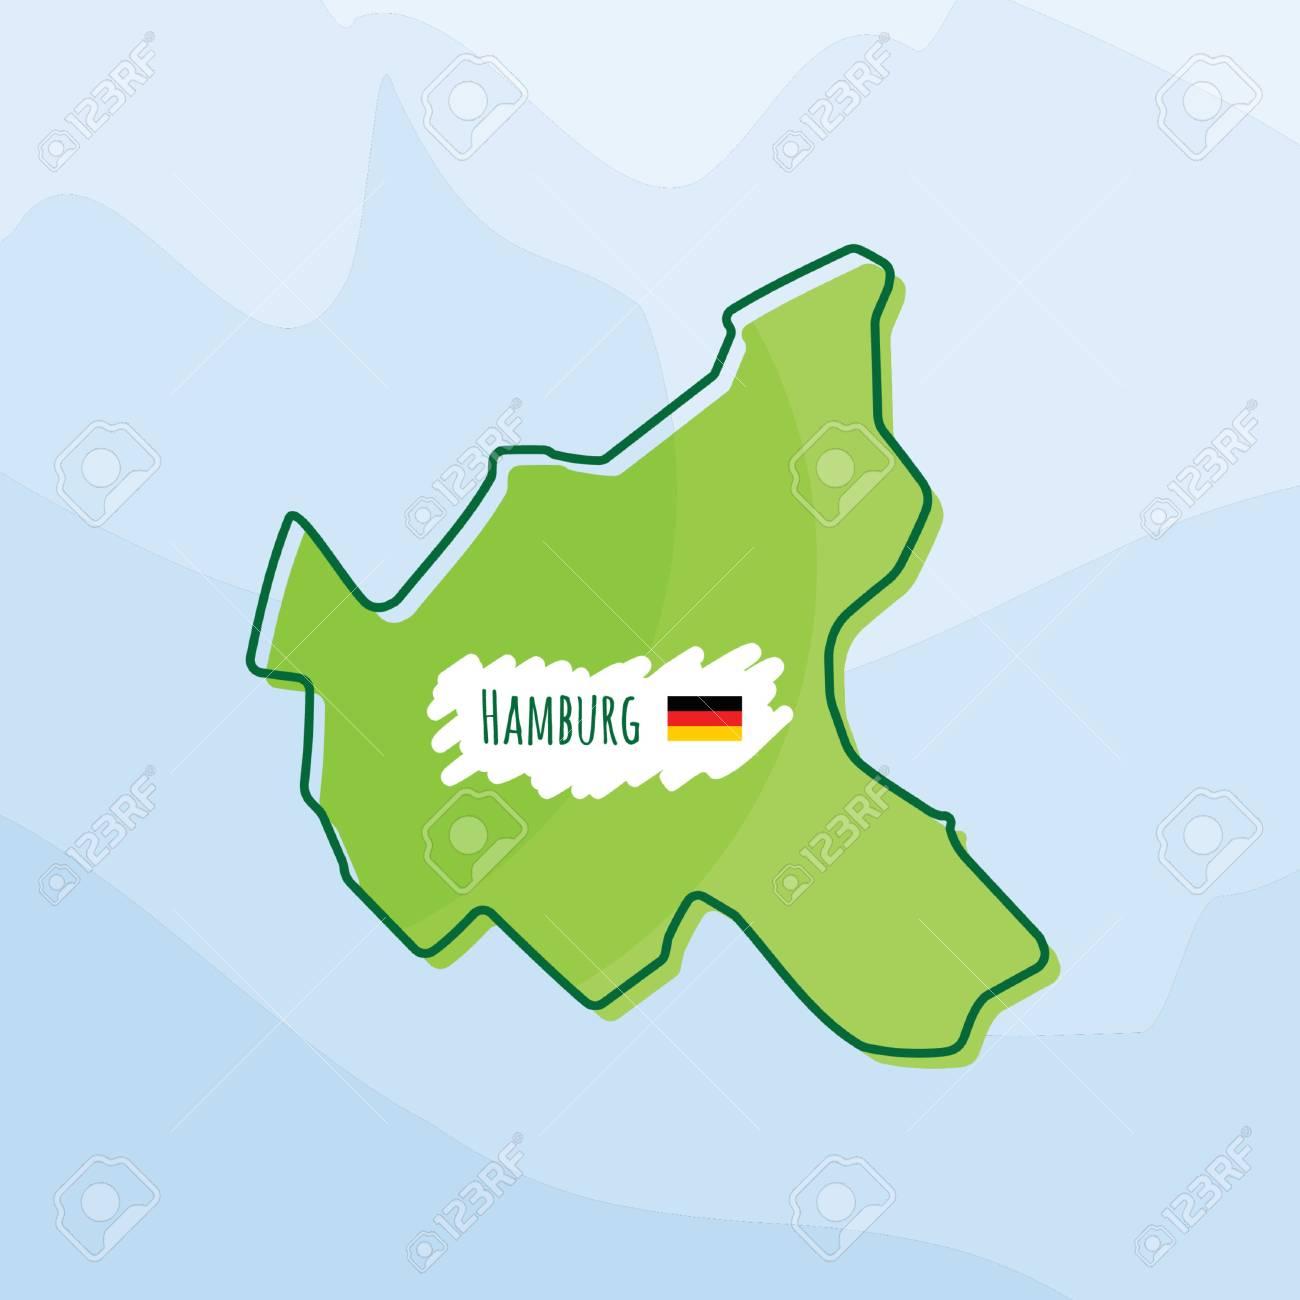 Map Of Germany Hamburg.Map Of Hamburg Germany